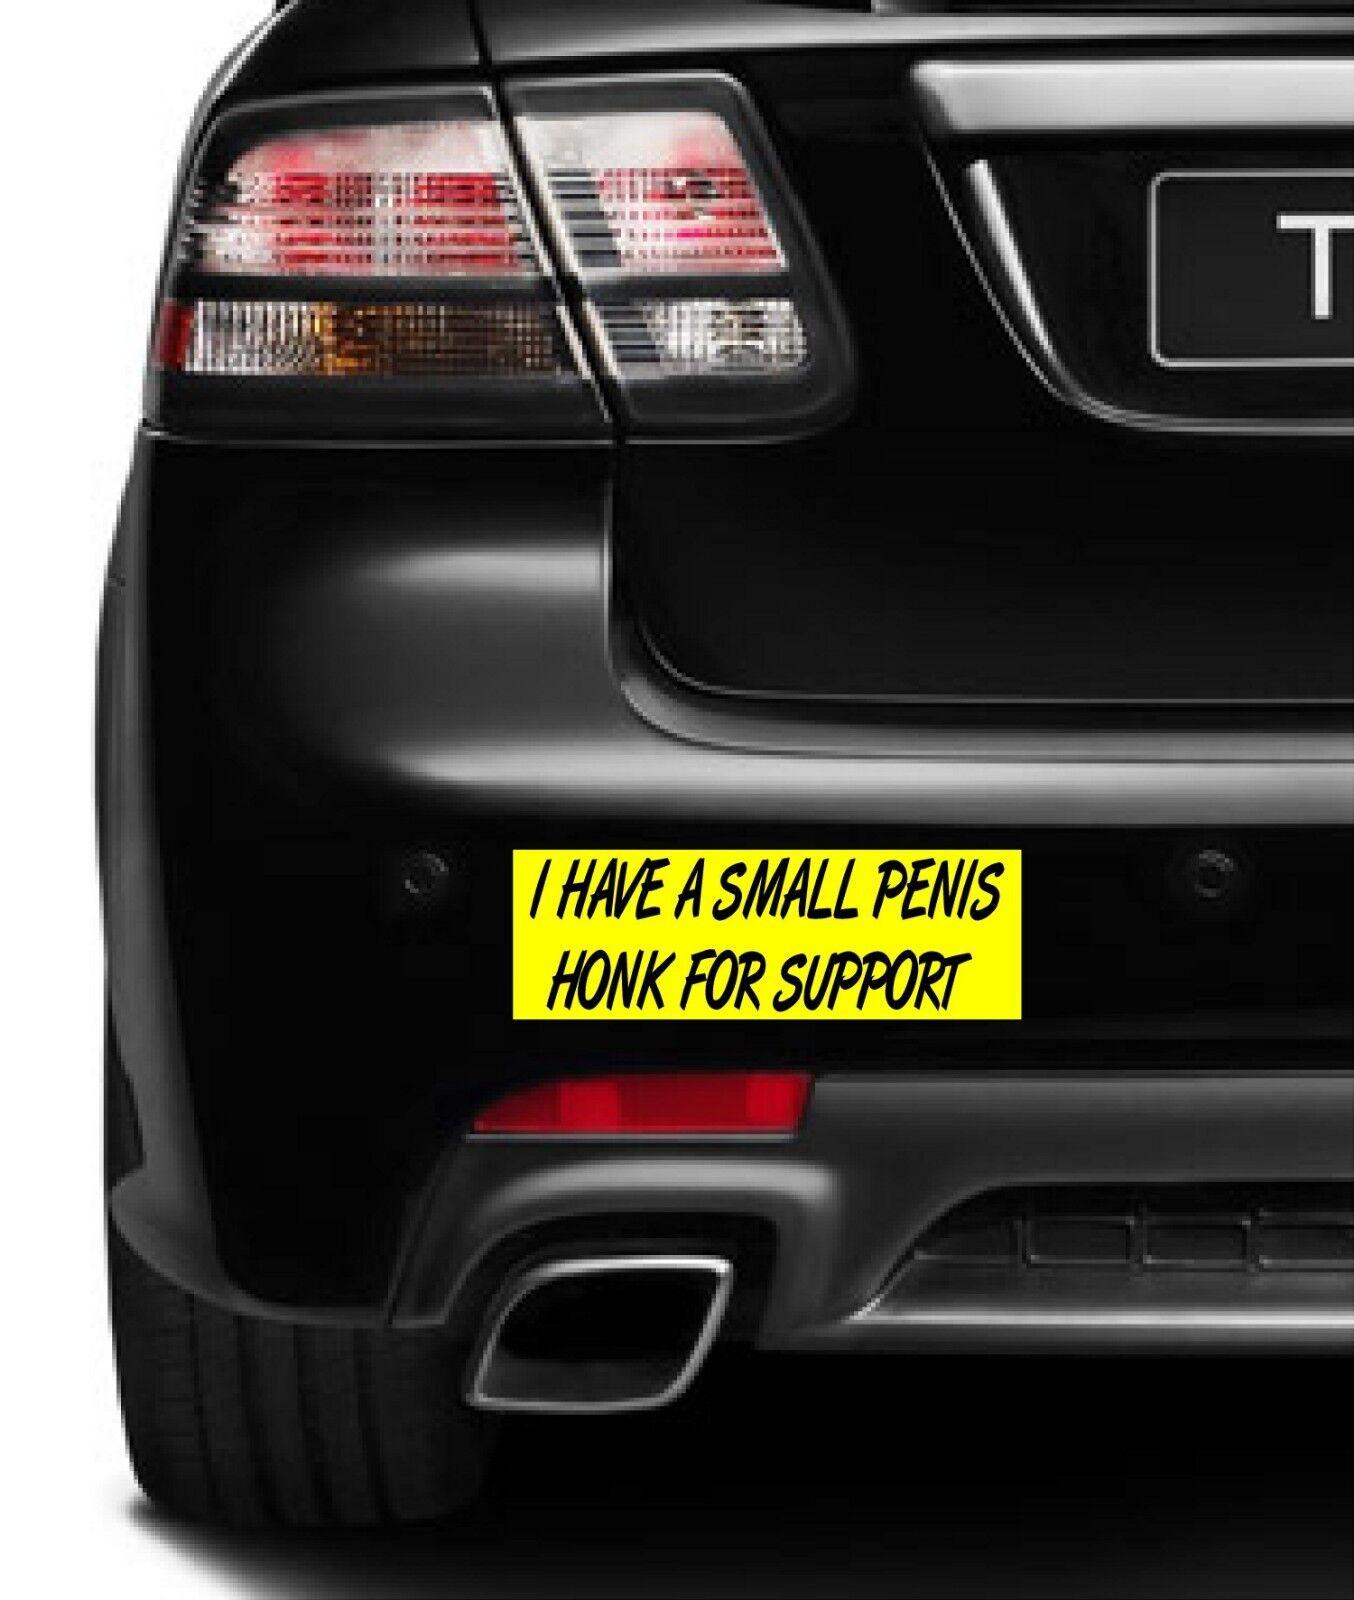 Follow ME to The Gay BAR Prank Funny Gag Joke Bumper Sticker Magnet 3x7